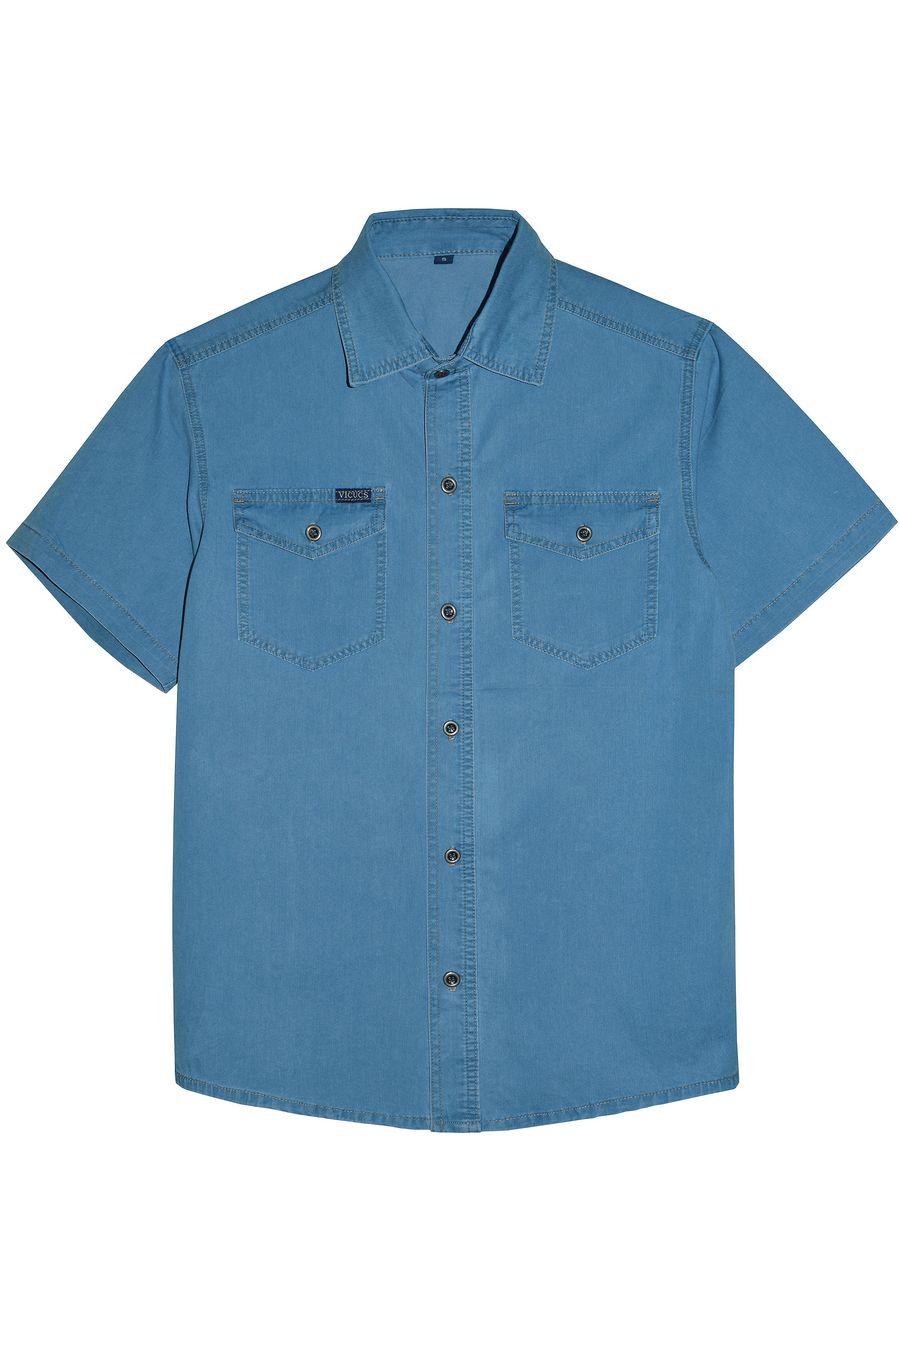 Рубашка мужская Vicucs 728E/CT-321-21 (S-2XL) - фото 1